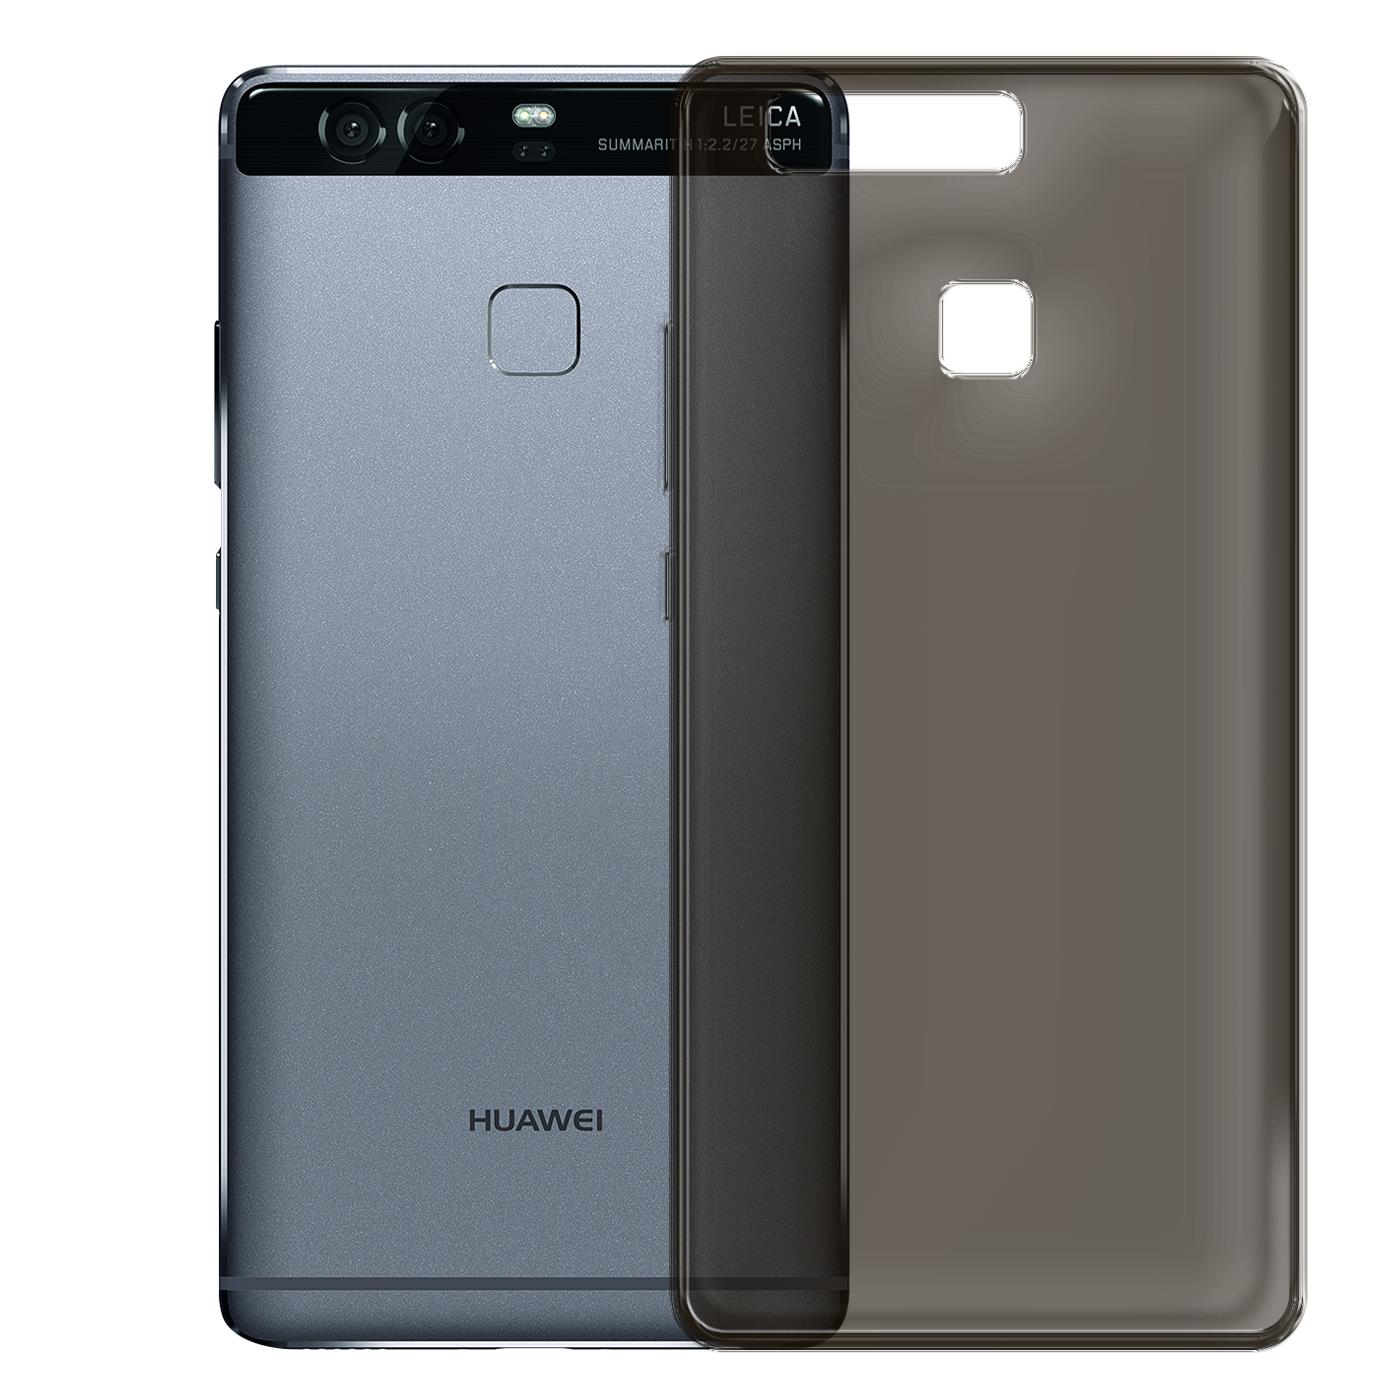 Huawei-p9-Duenn-Silikon-Klar-Case-Cover-Ultra-Slim-Stossfeste-Gel-Rueckseite Indexbild 28